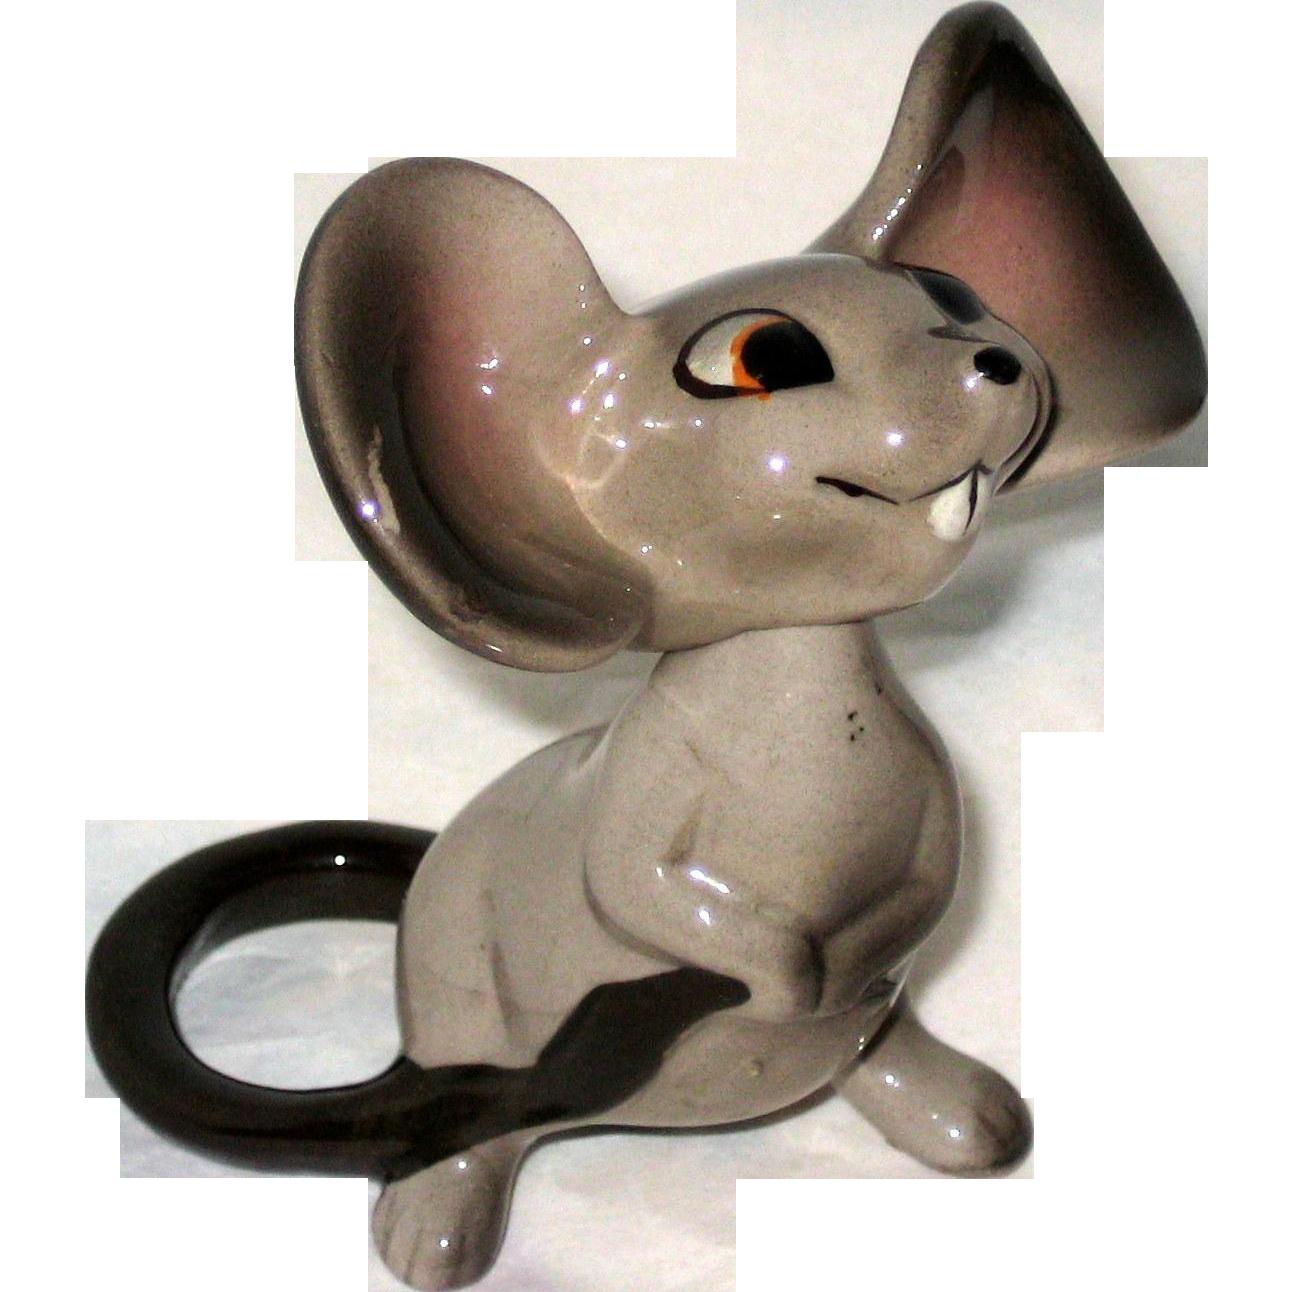 Cute Two Piece Porcelain Mouse Figurine